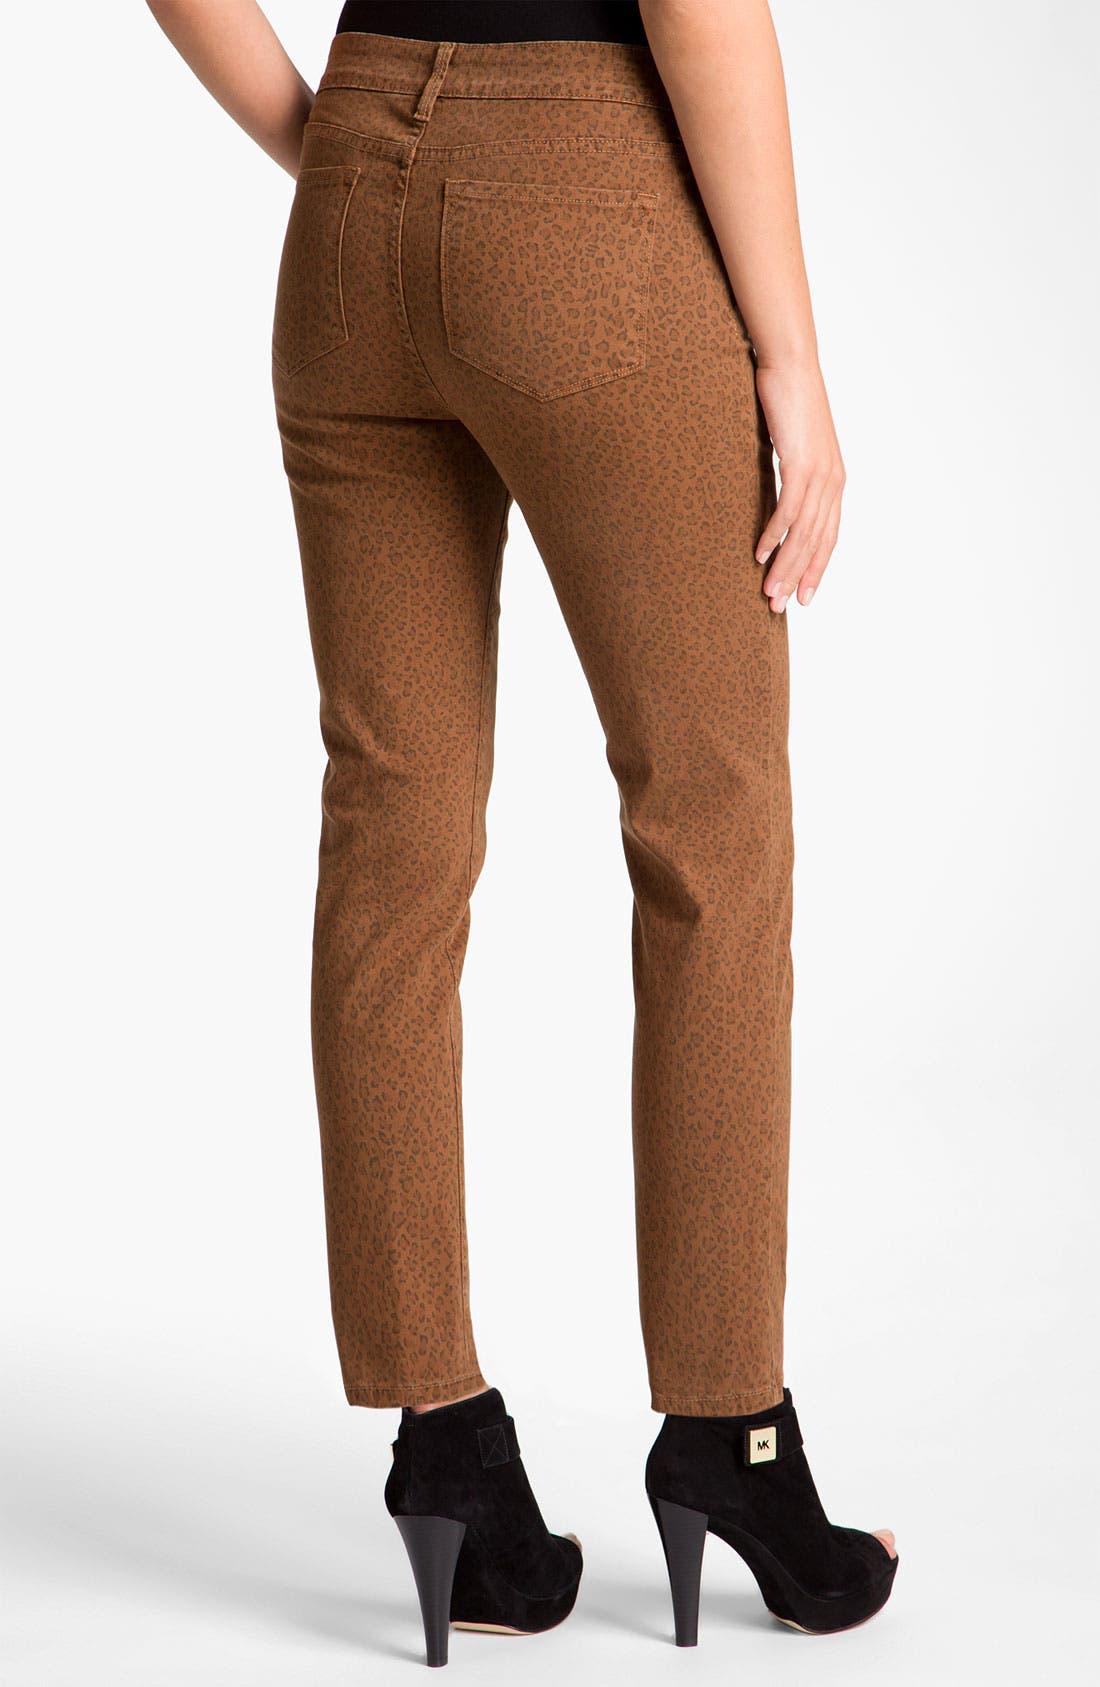 Main Image - NYDJ 'Alisha' Leopard Print Twill Ankle Jeans